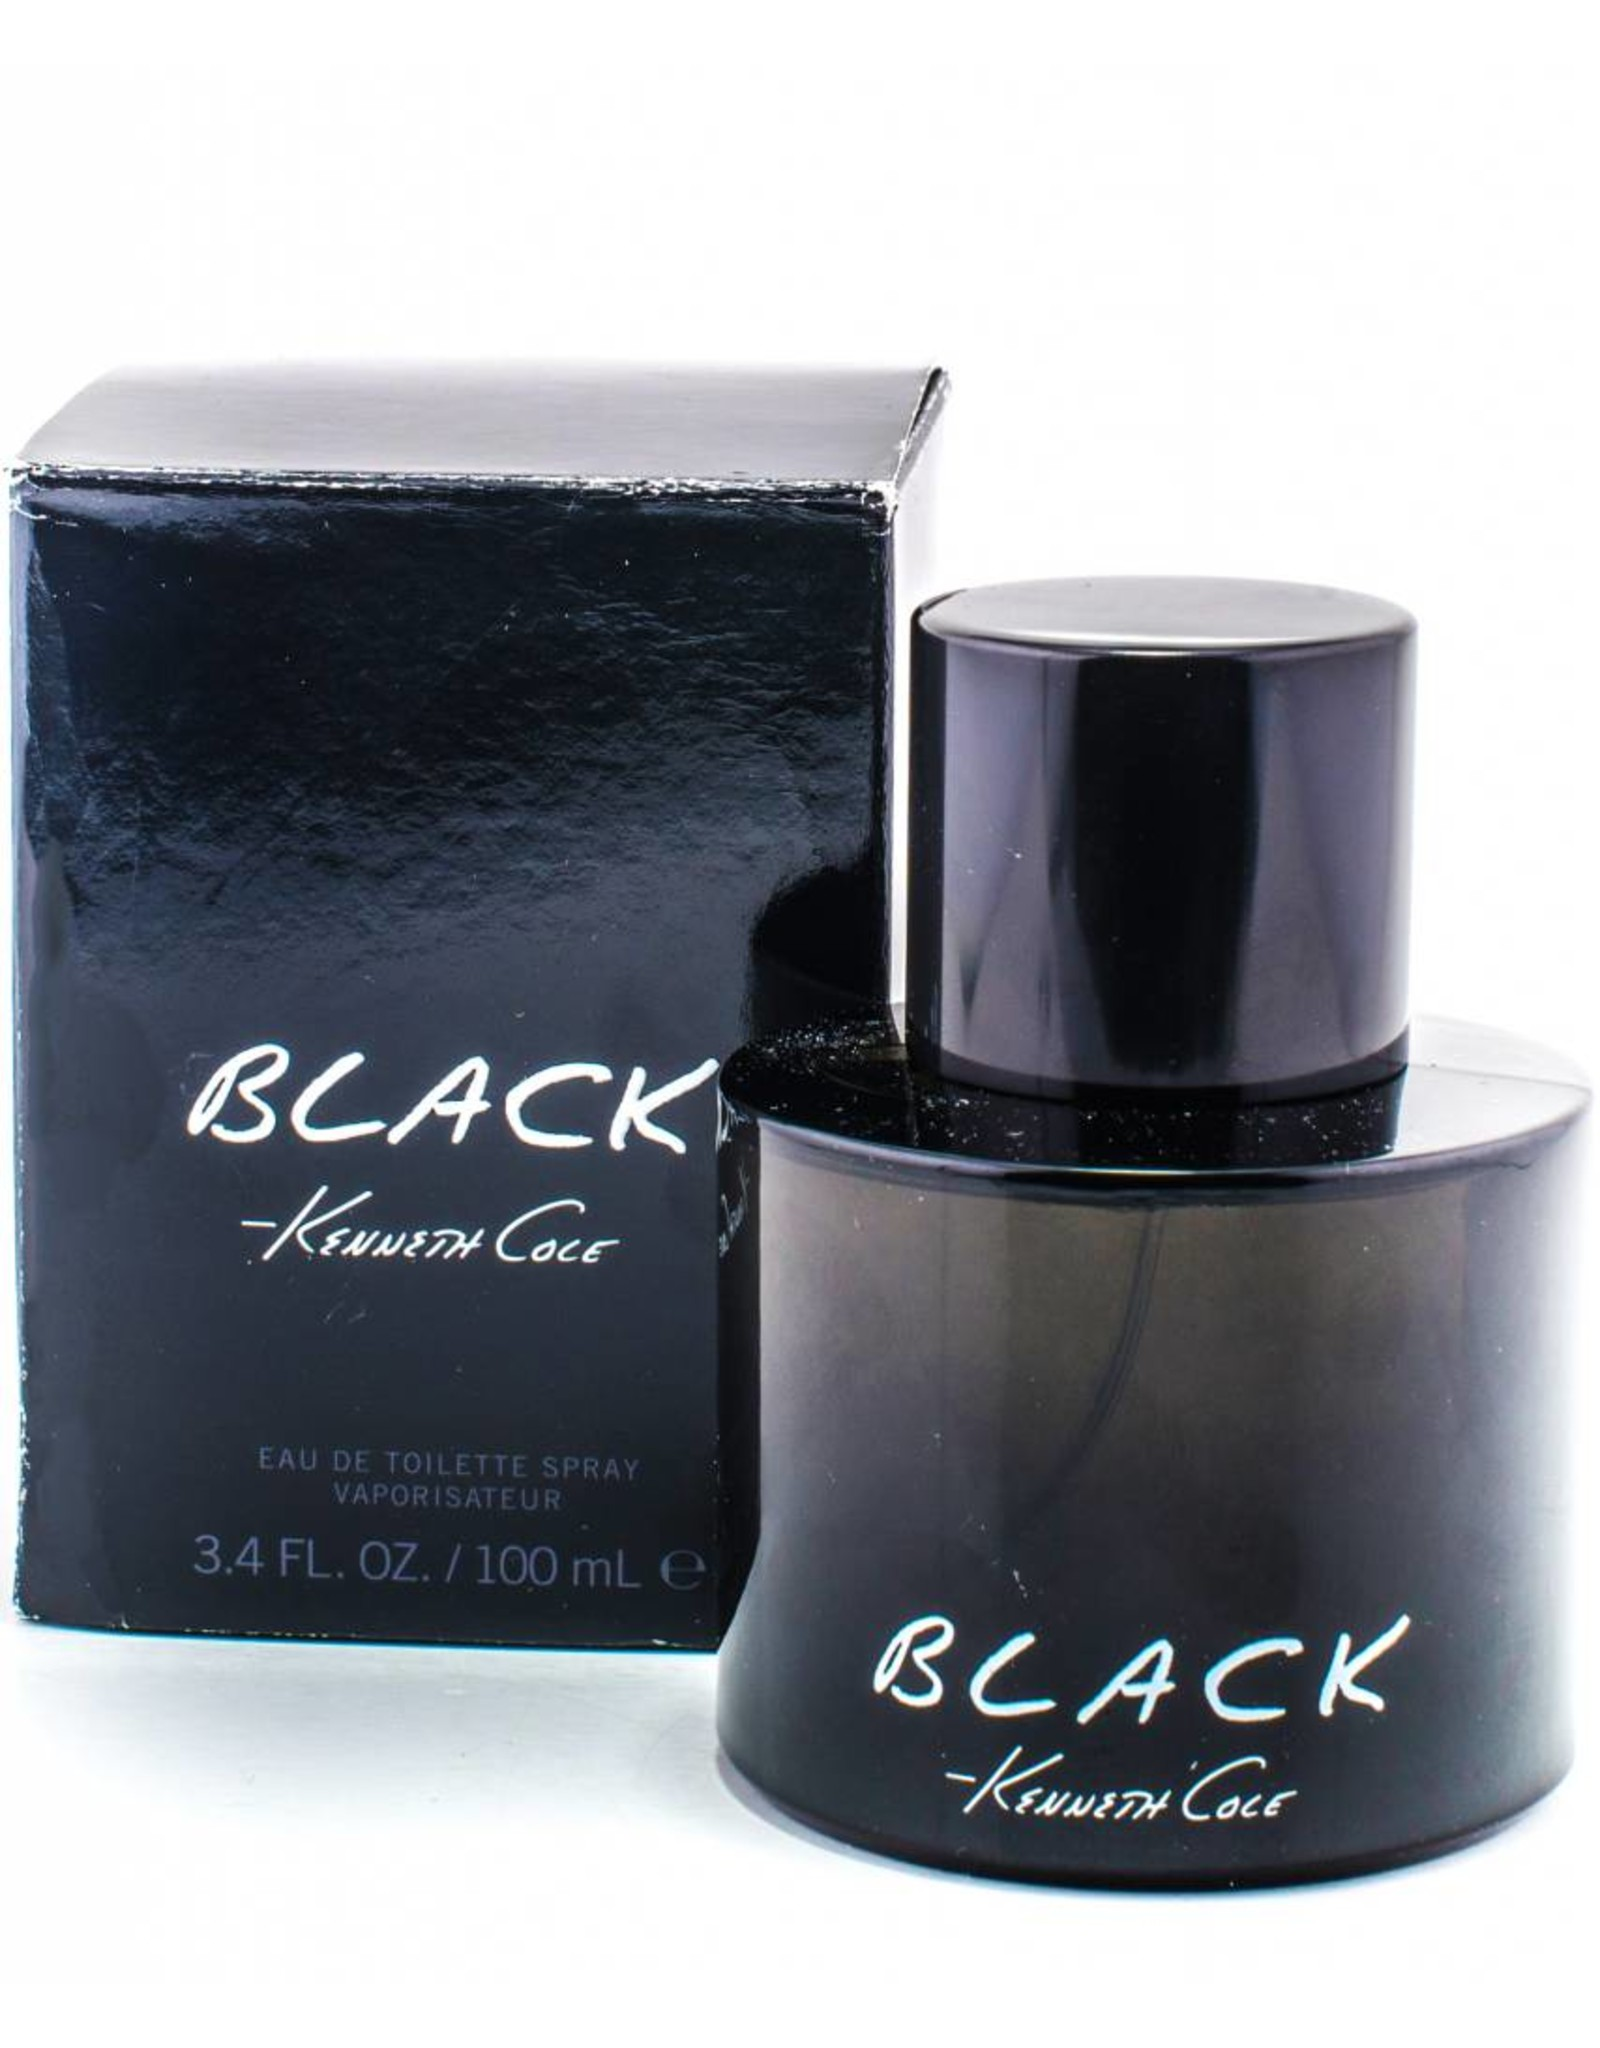 KENNETH COLE KENNETH COLE BLACK